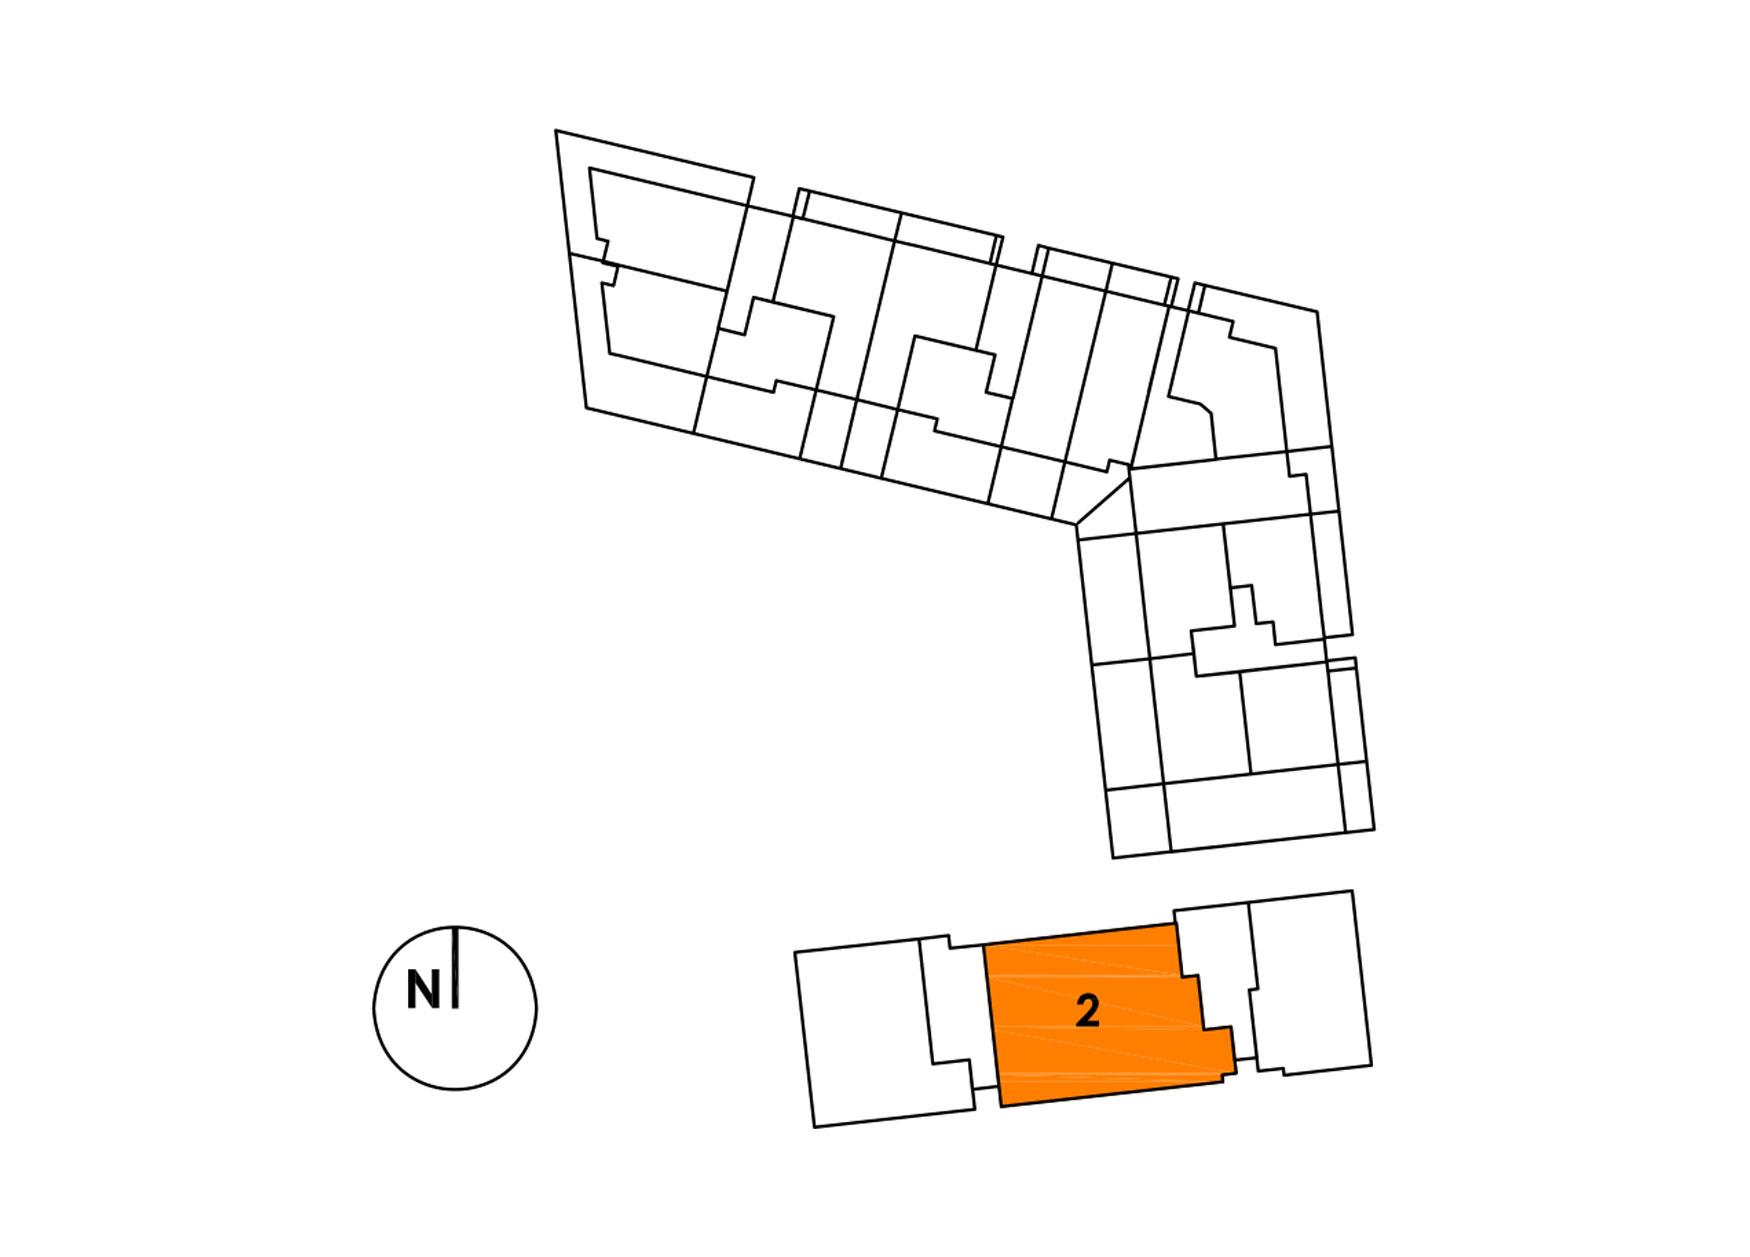 Andia-ardoi-plano-local-1